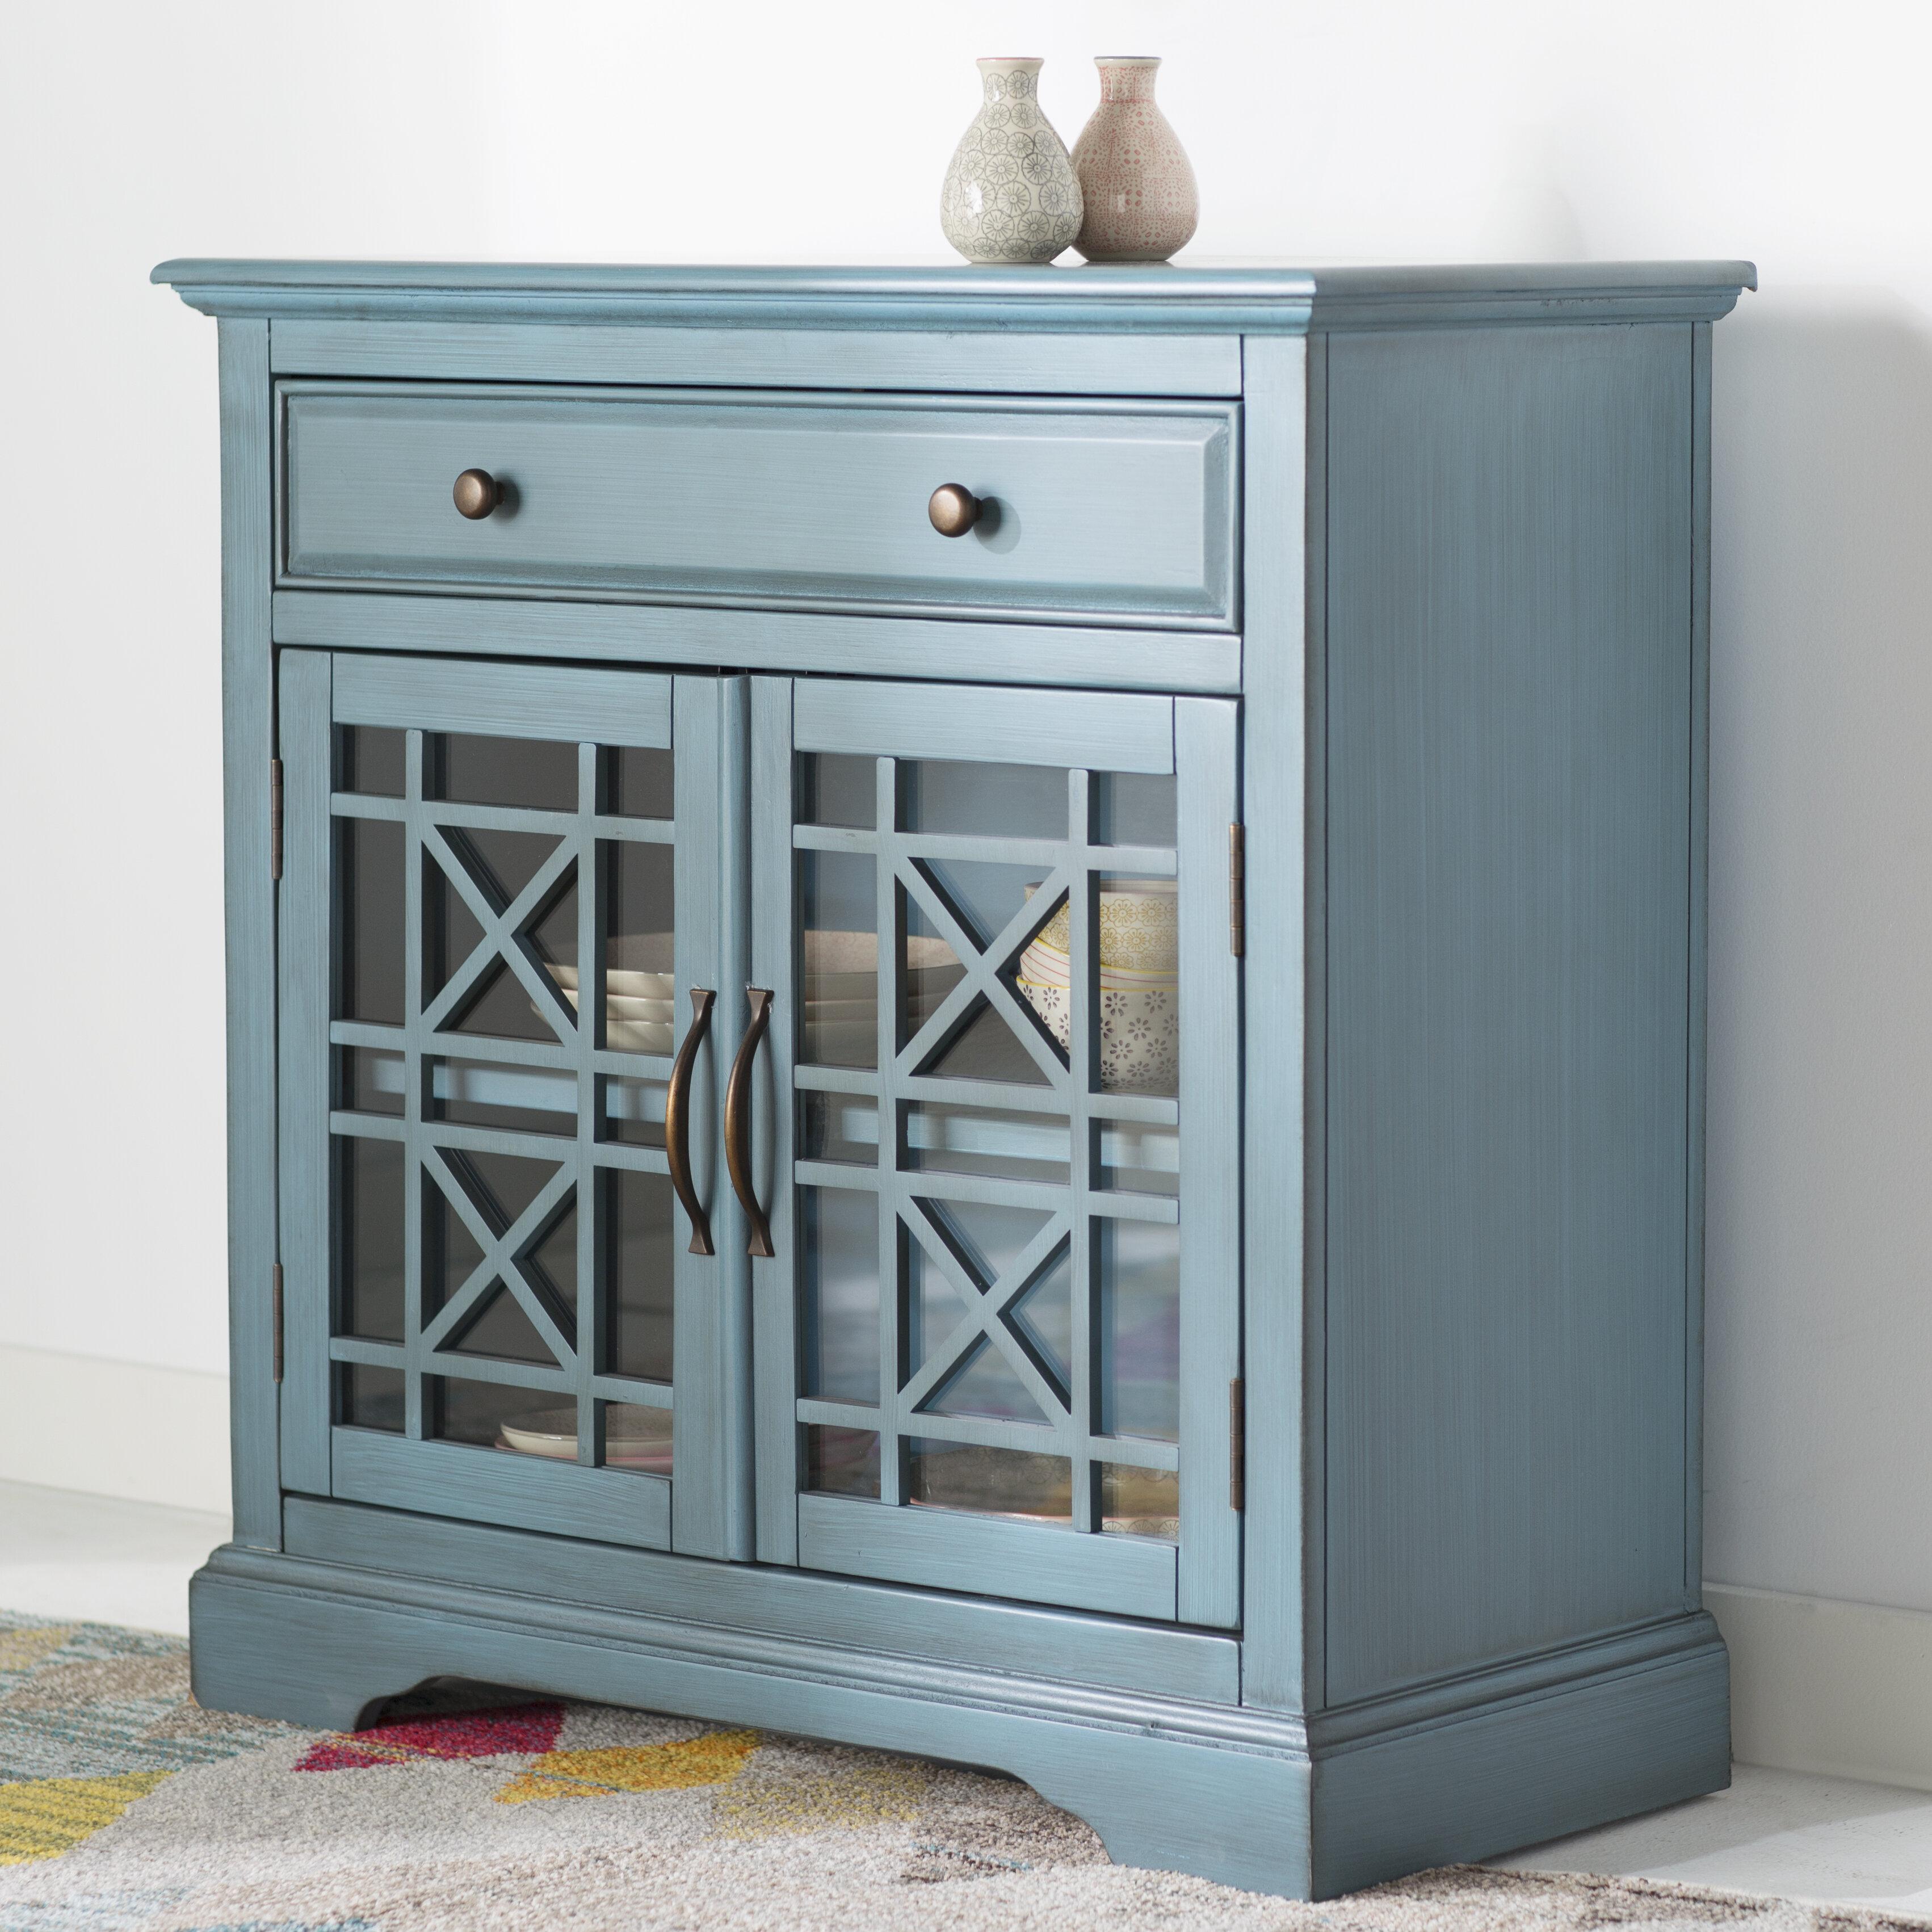 Mistana Daisi 1 Drawer 2 Door Accent Cabinet & Reviews | Wayfair